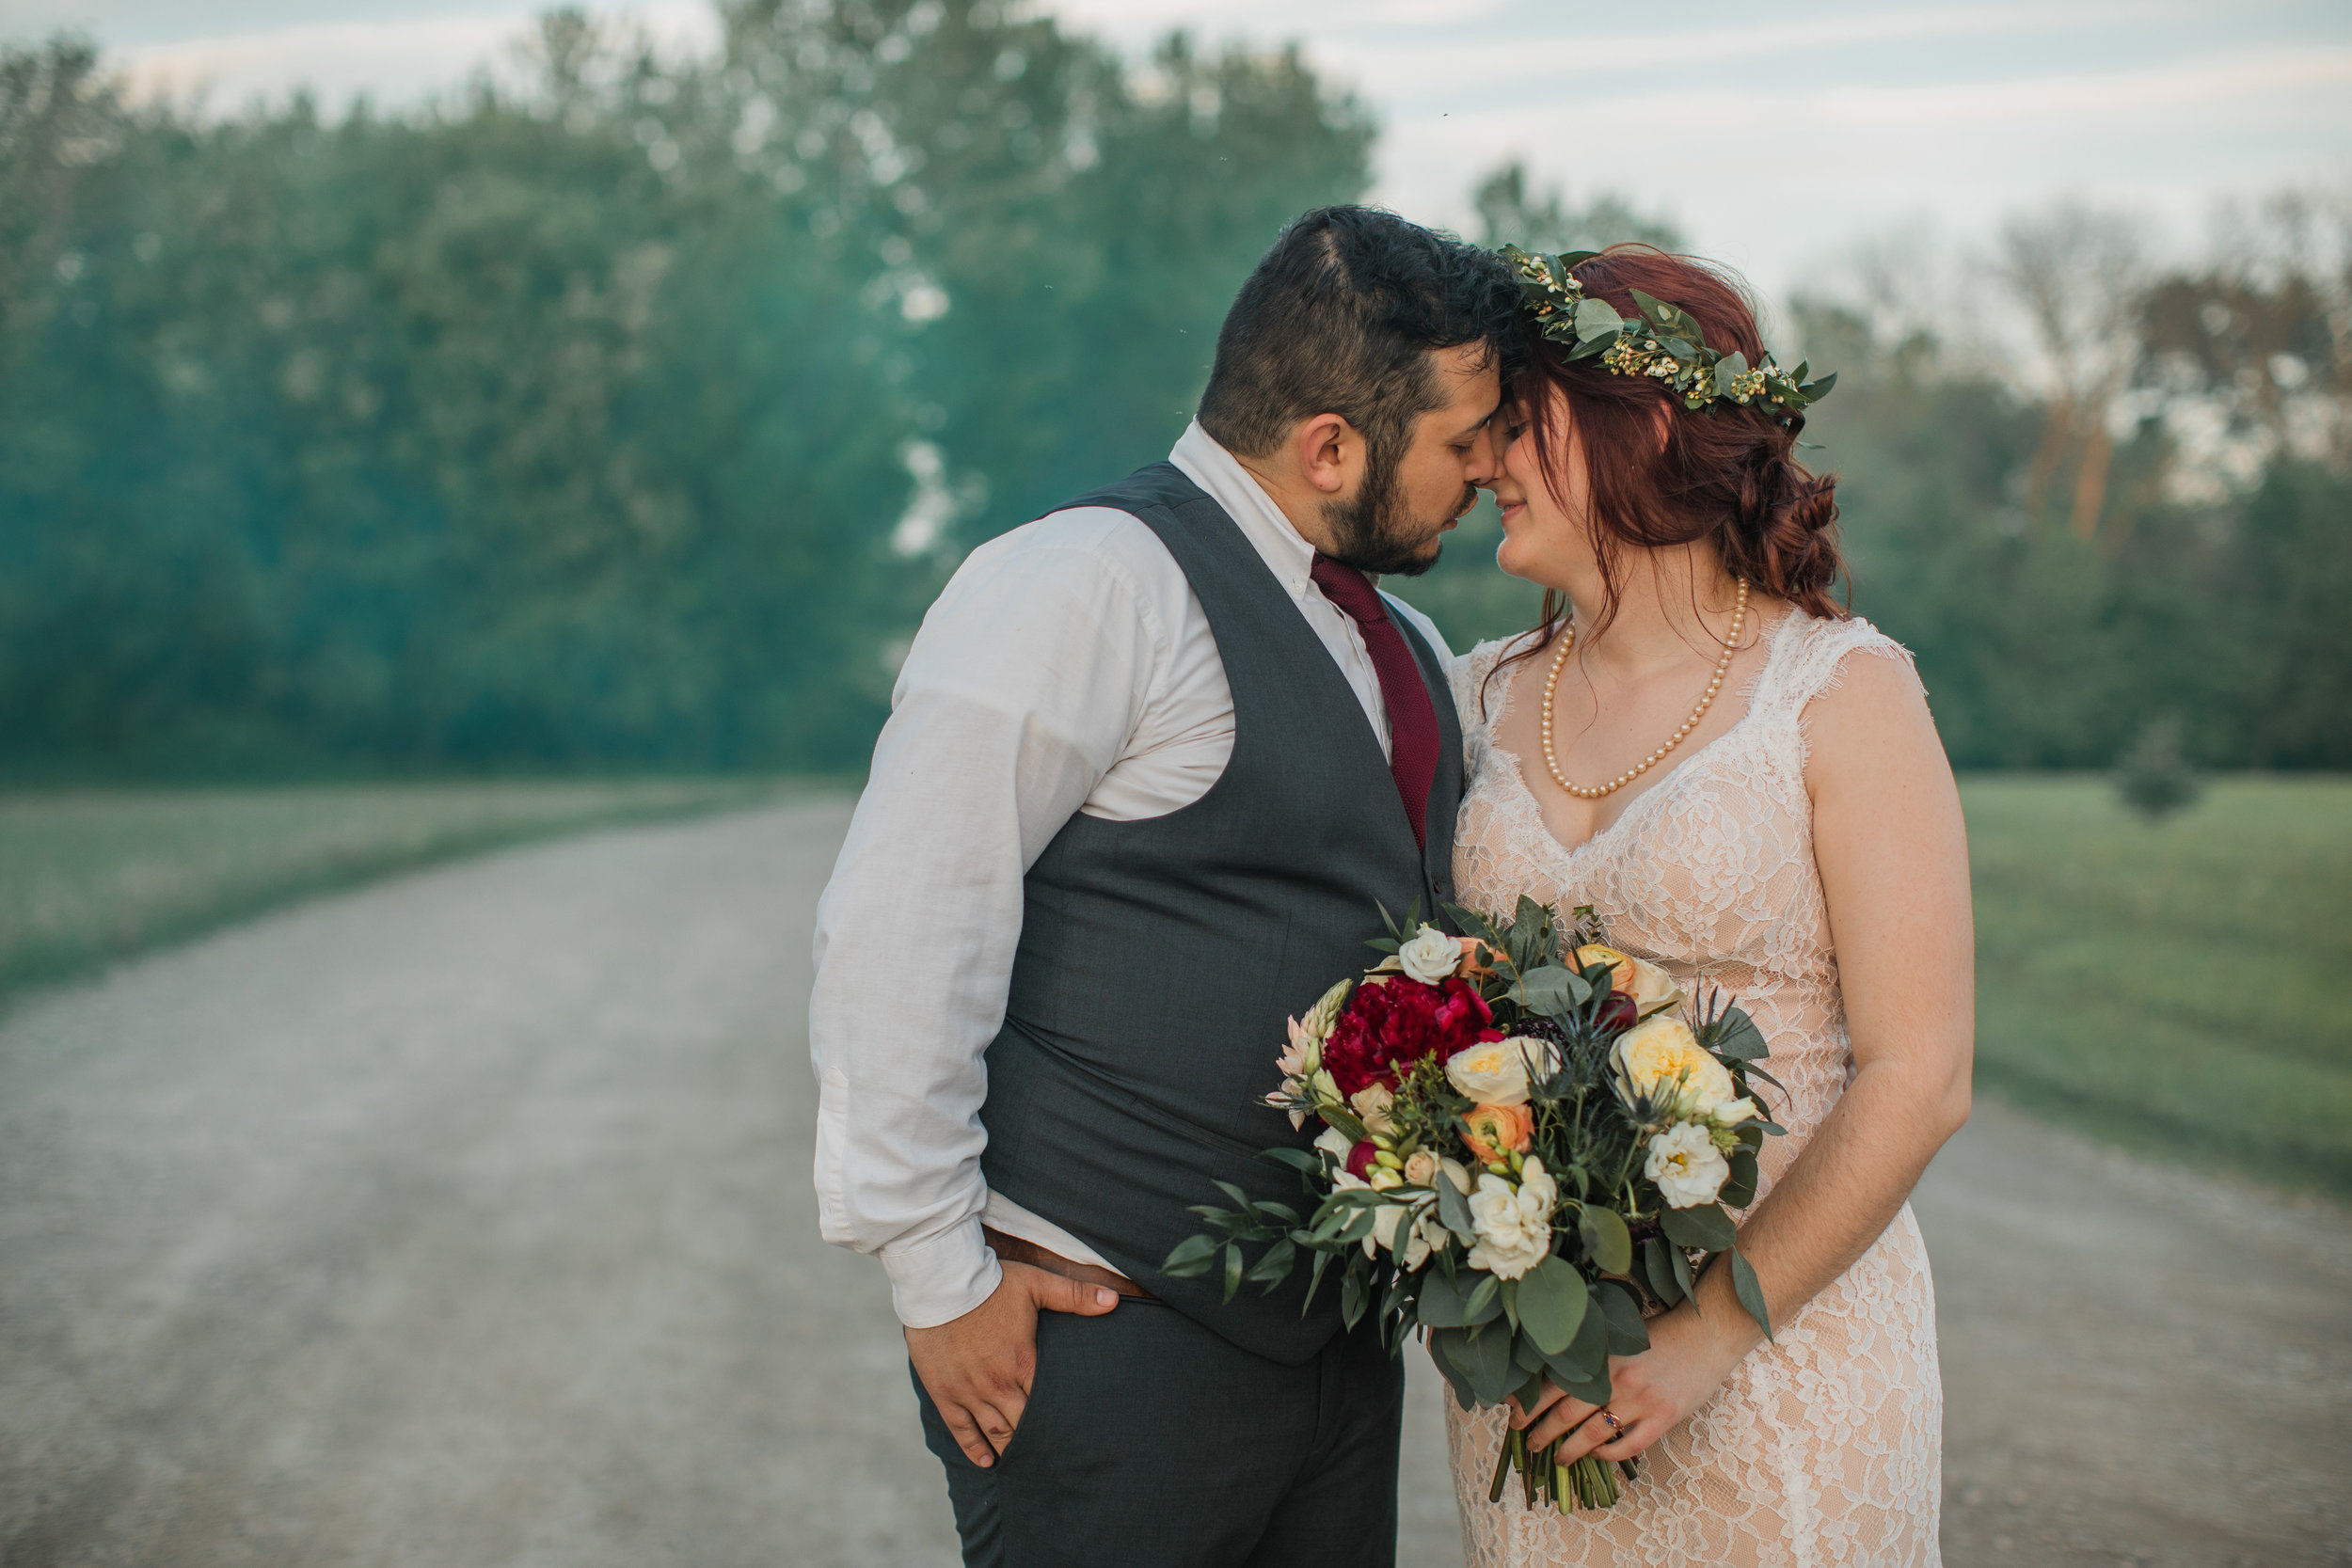 wedding photography cool smoke bombs des moines iowa amelia renee